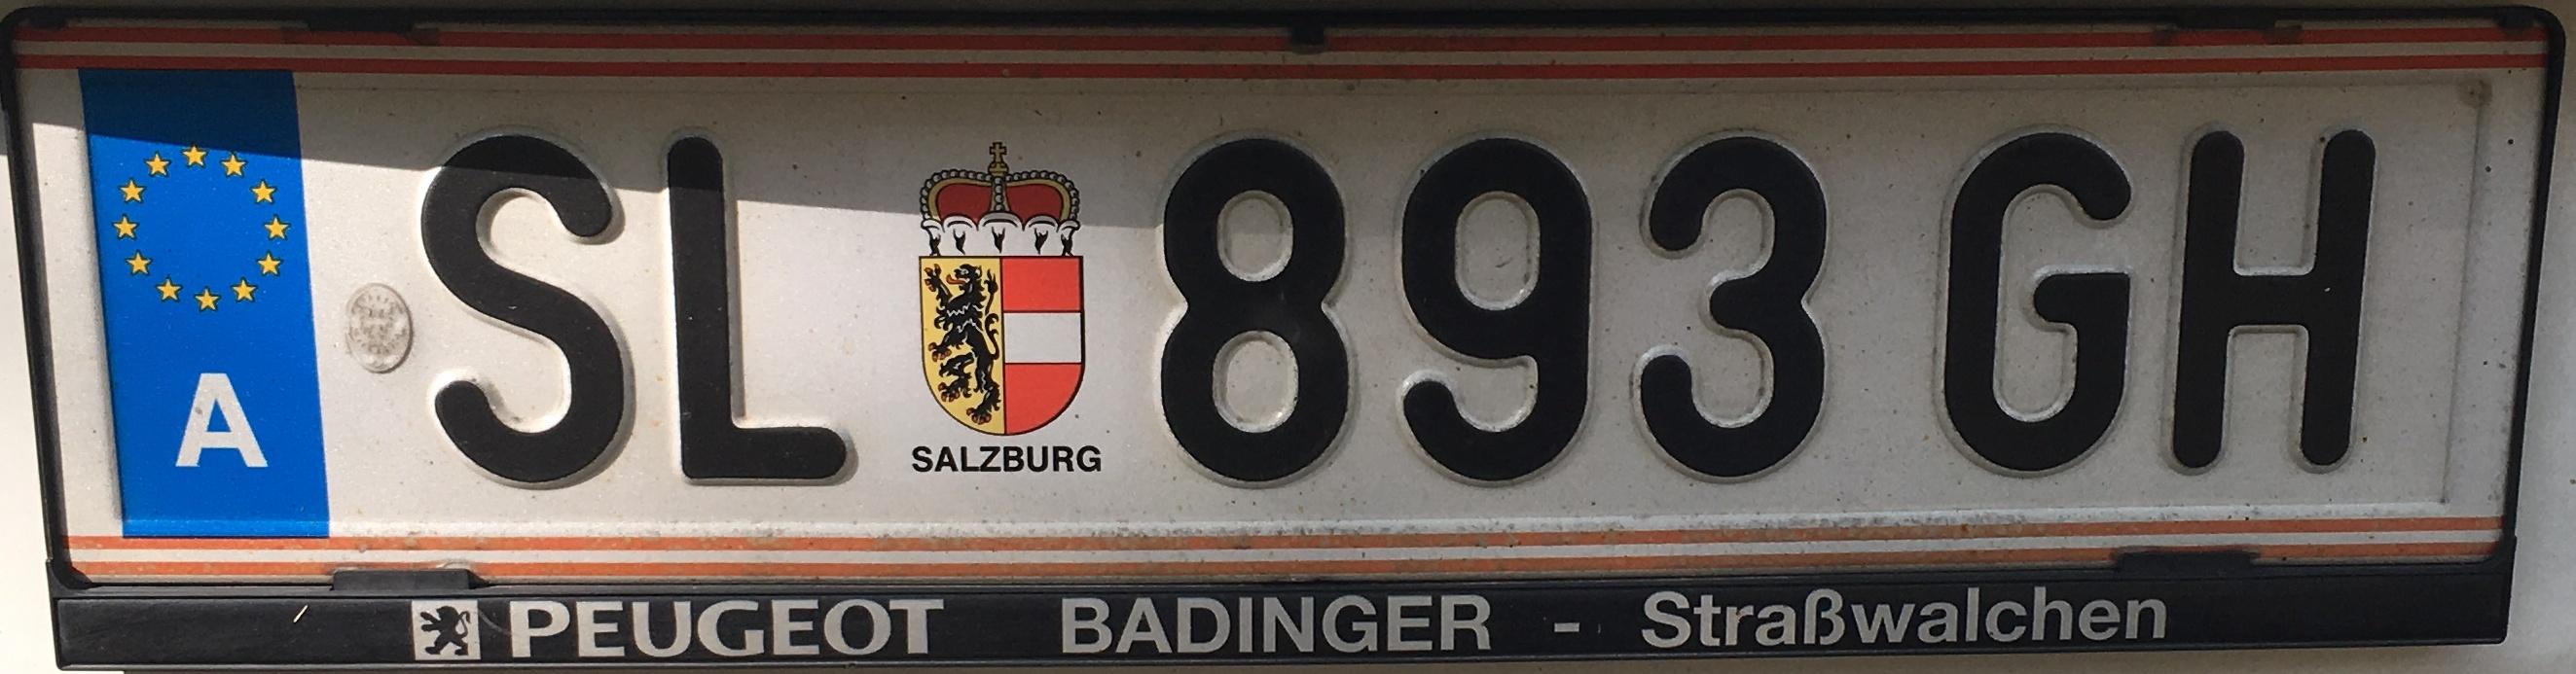 Registrační značka Rakousko - SL - Salzburg-venkov, foto: Po dálnici.cz